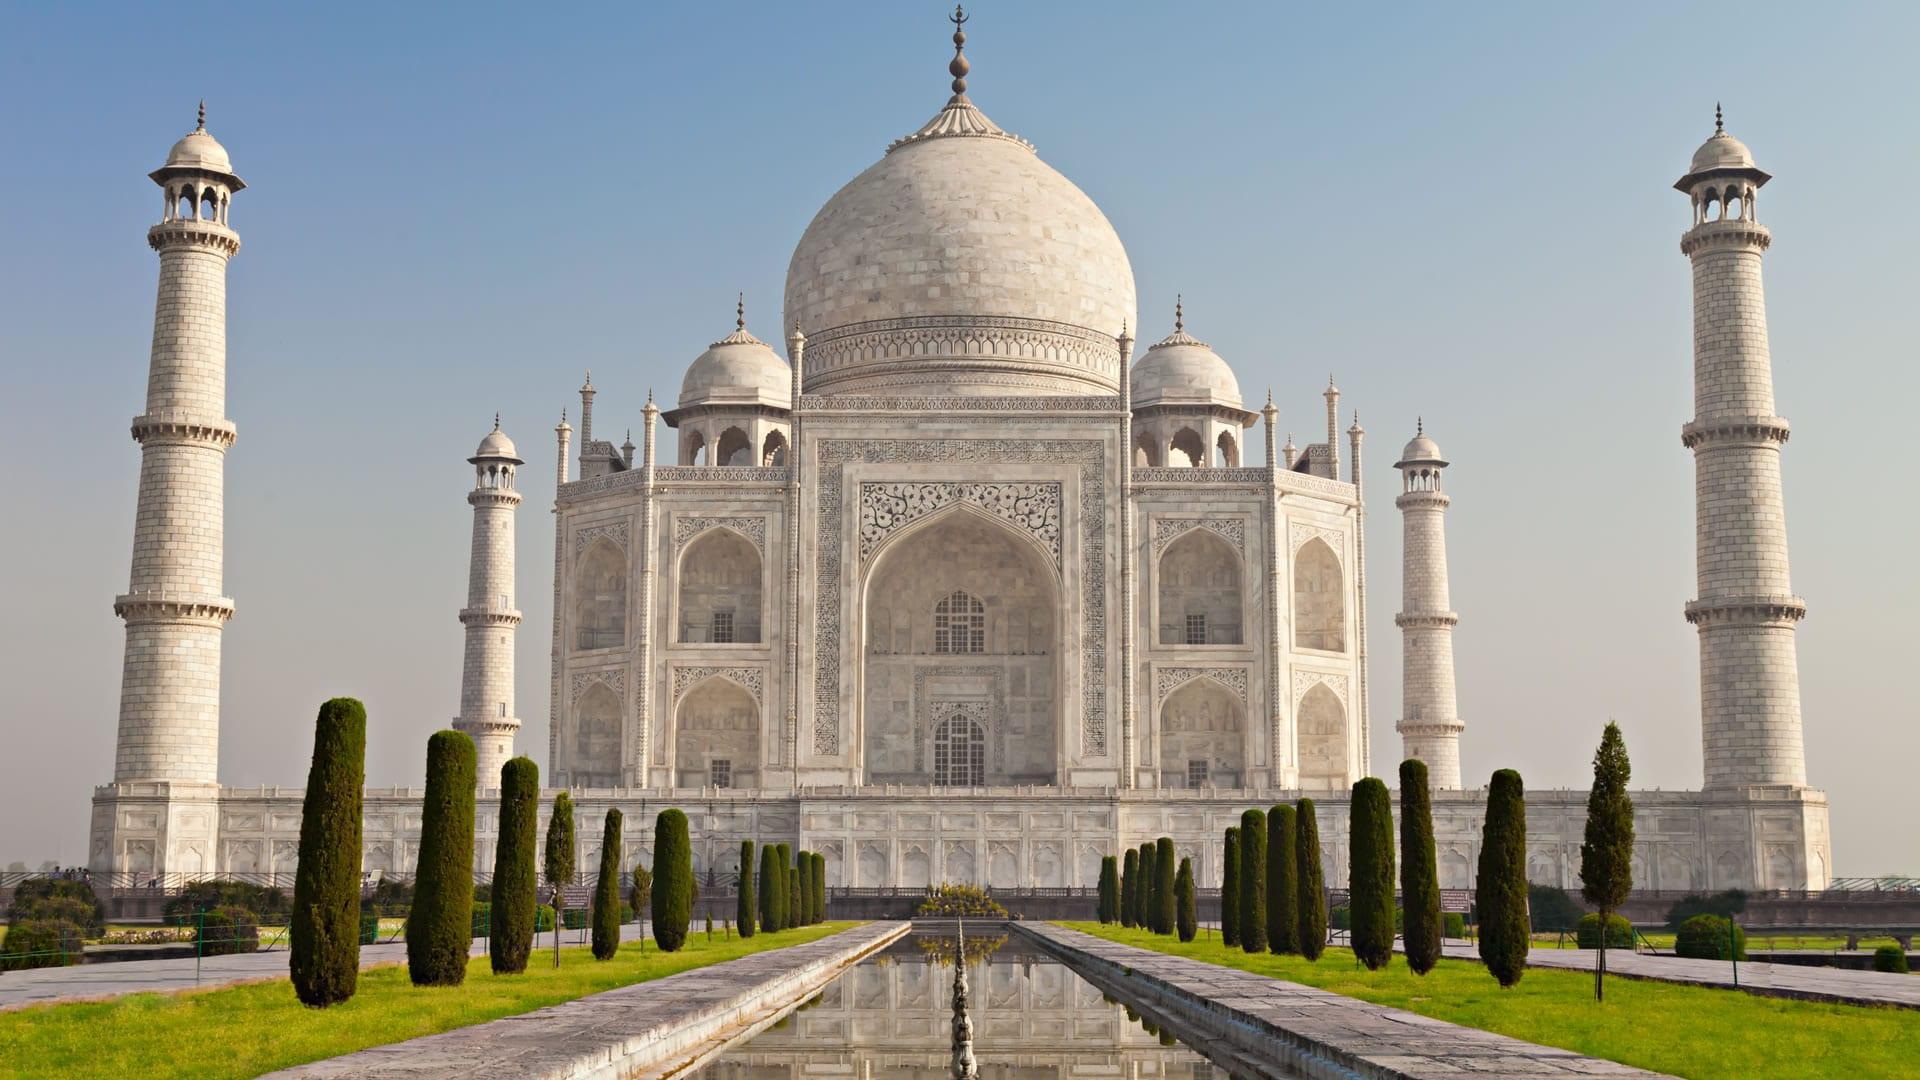 Arquitectura de la Cultura India: